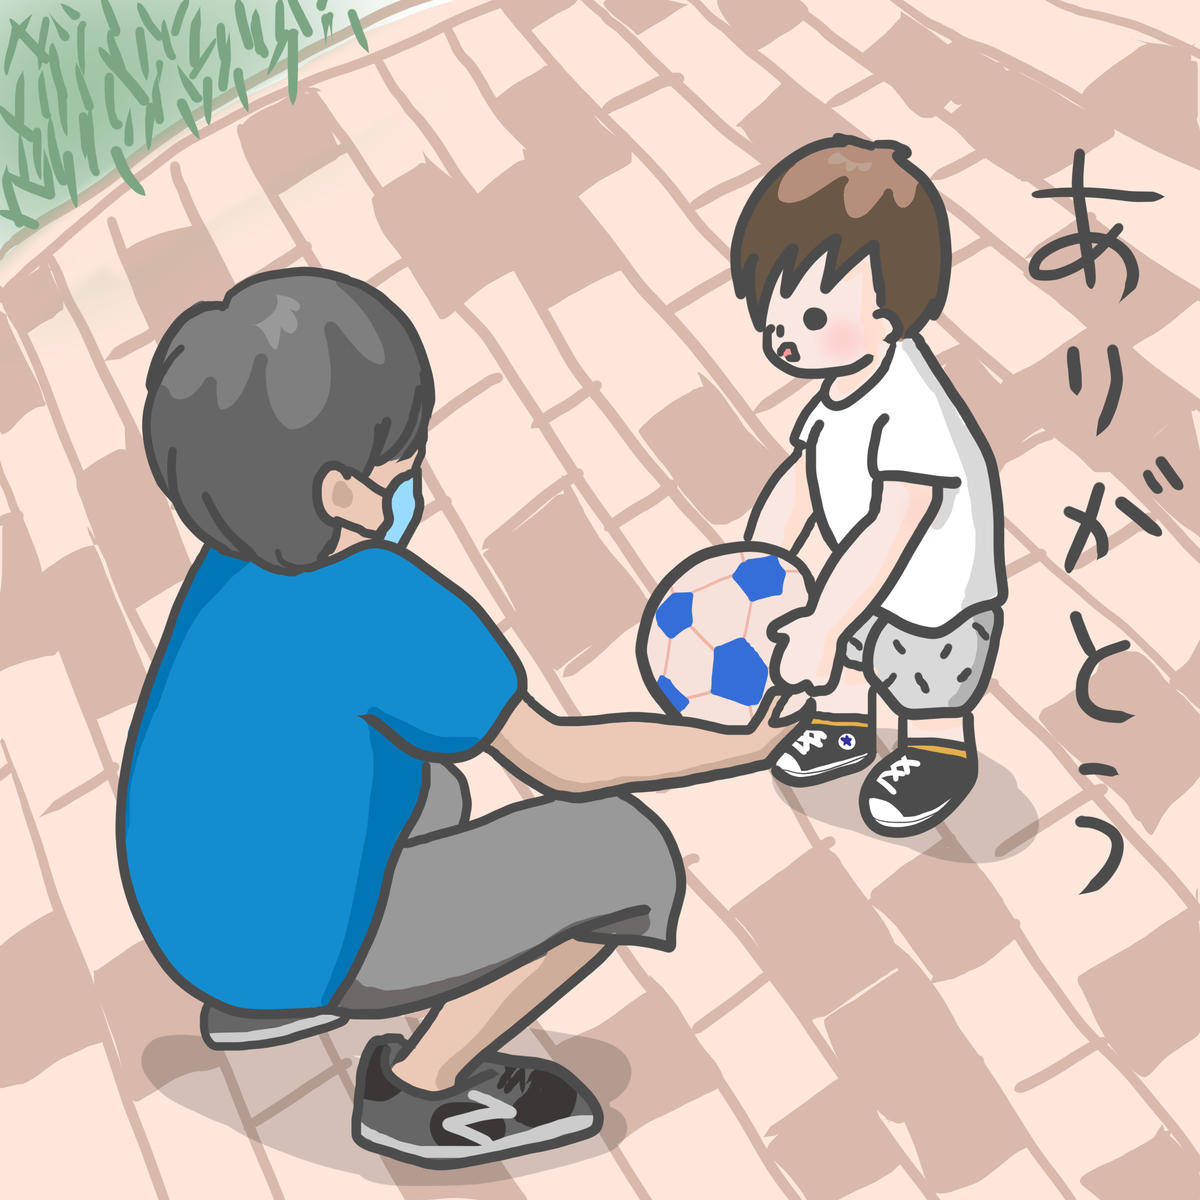 f:id:ika_yoshi:20201206005356j:plain